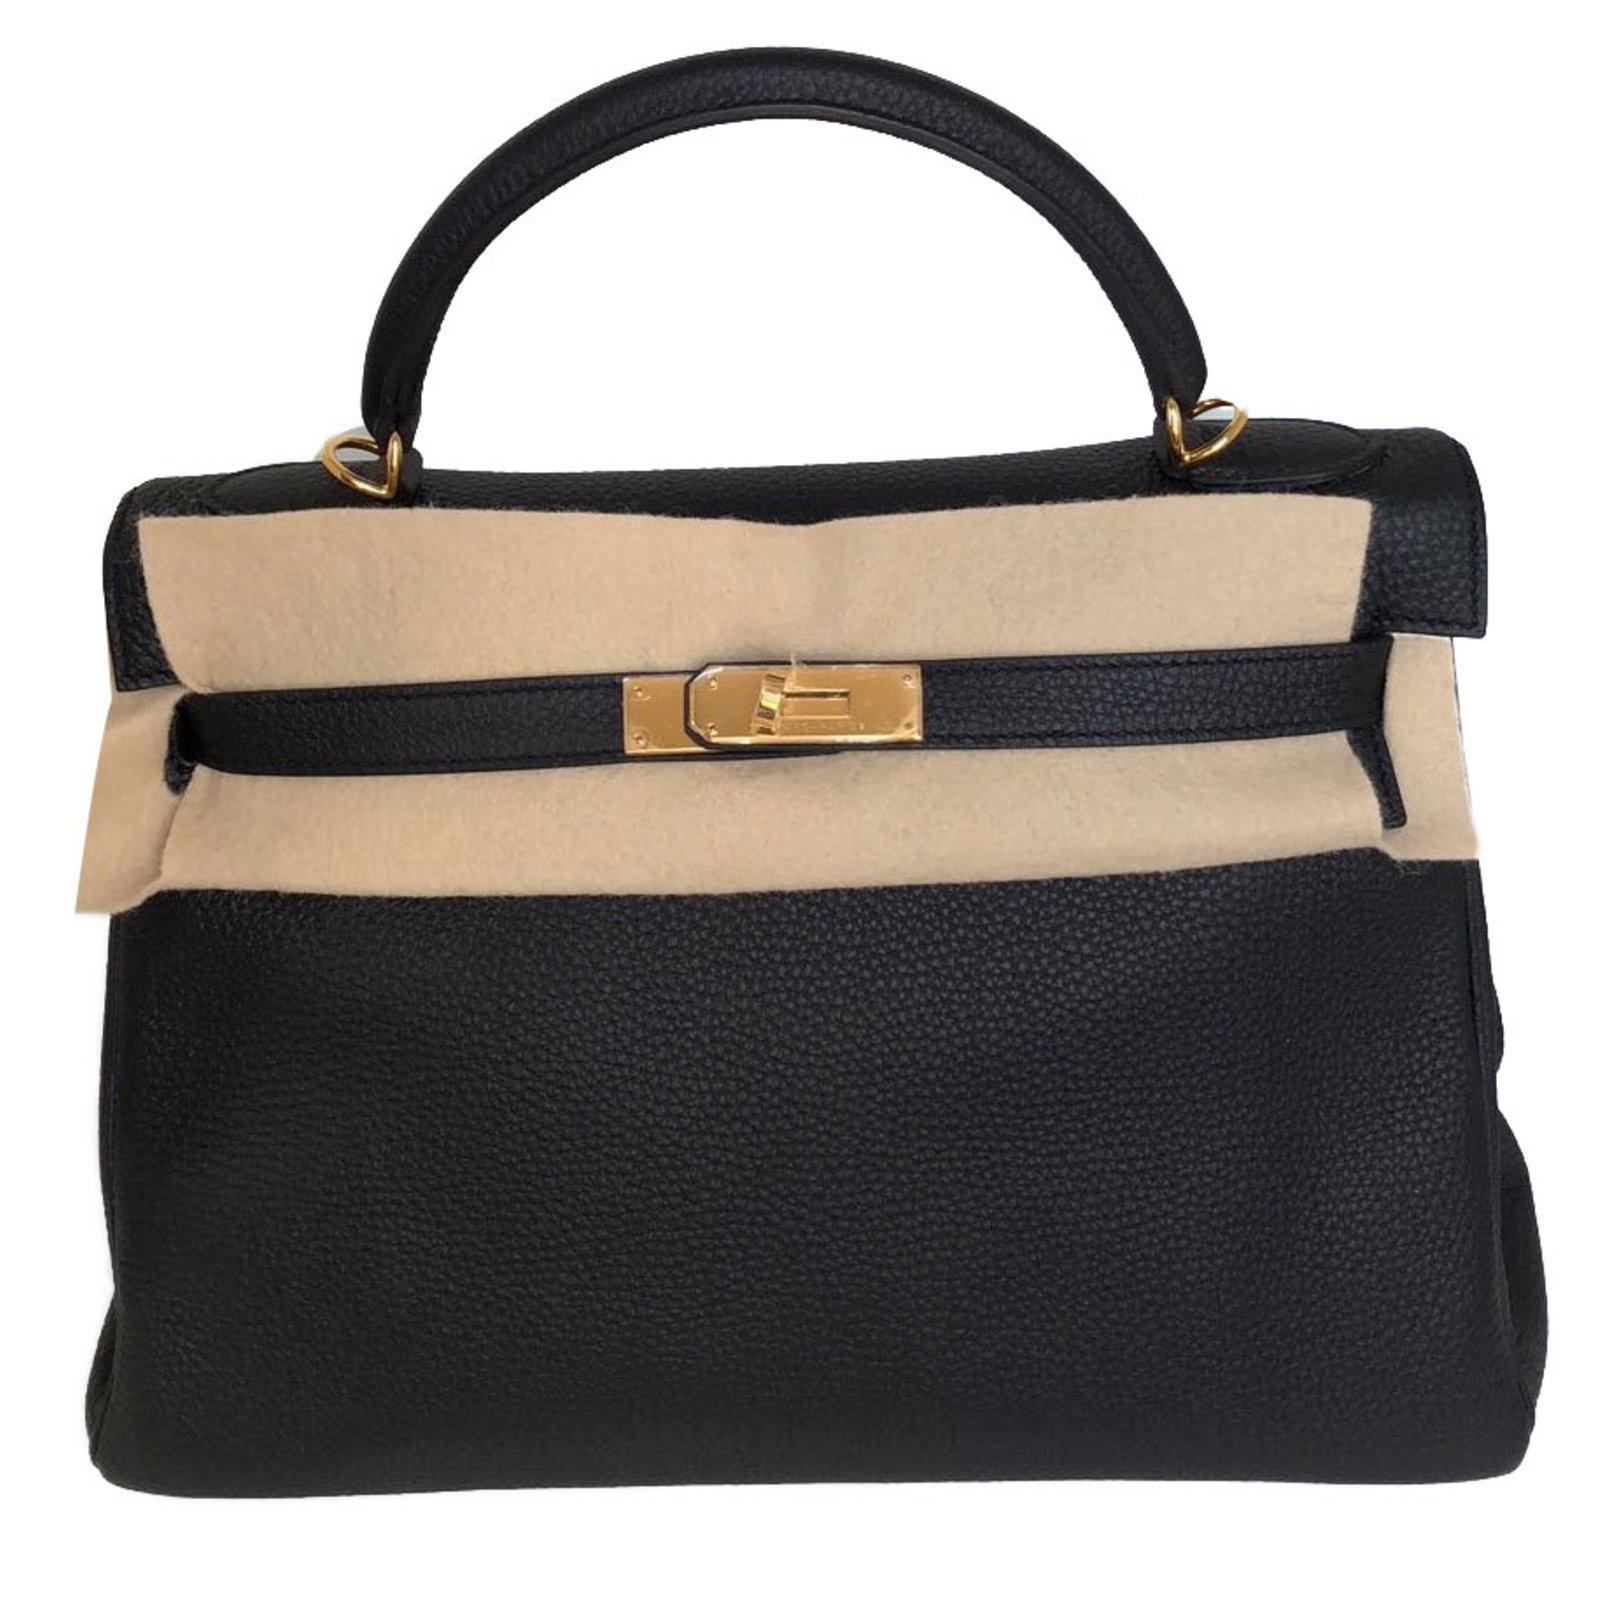 add65f612a29 ... ebay hermès kelly 32 handbags leather black ref.76124 94110 3e34e